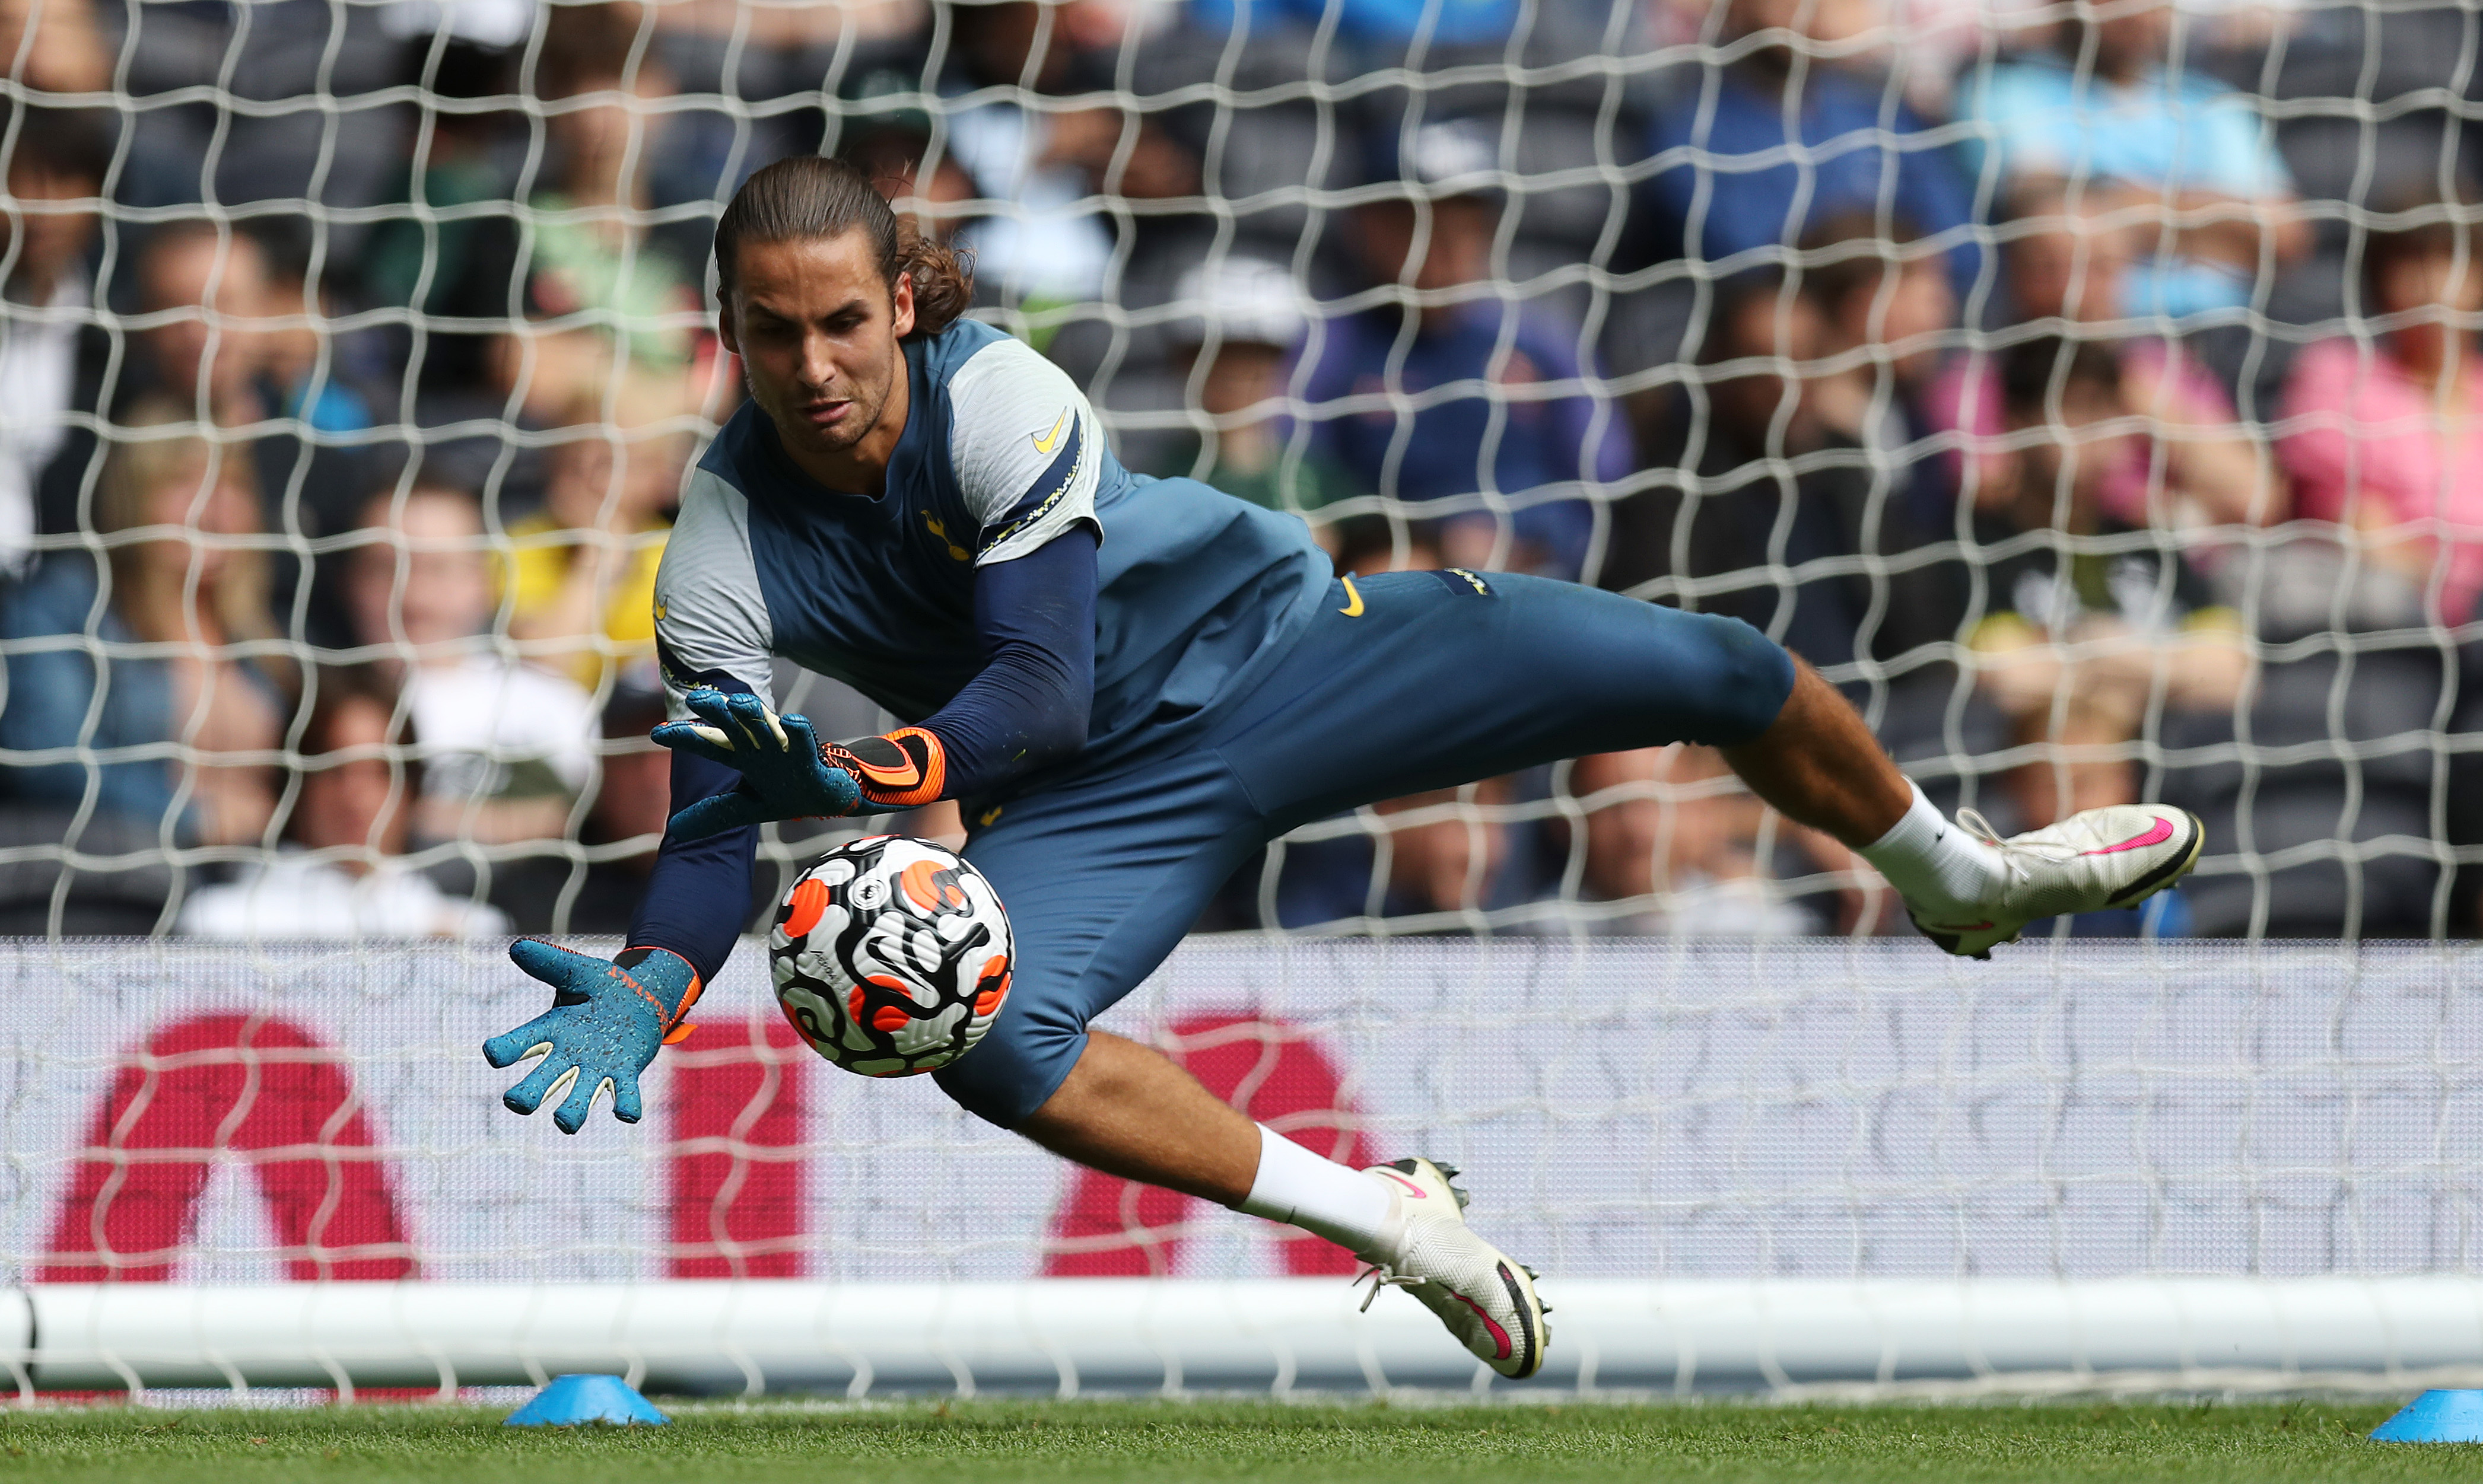 Tottenham Hotspur Open Training Session